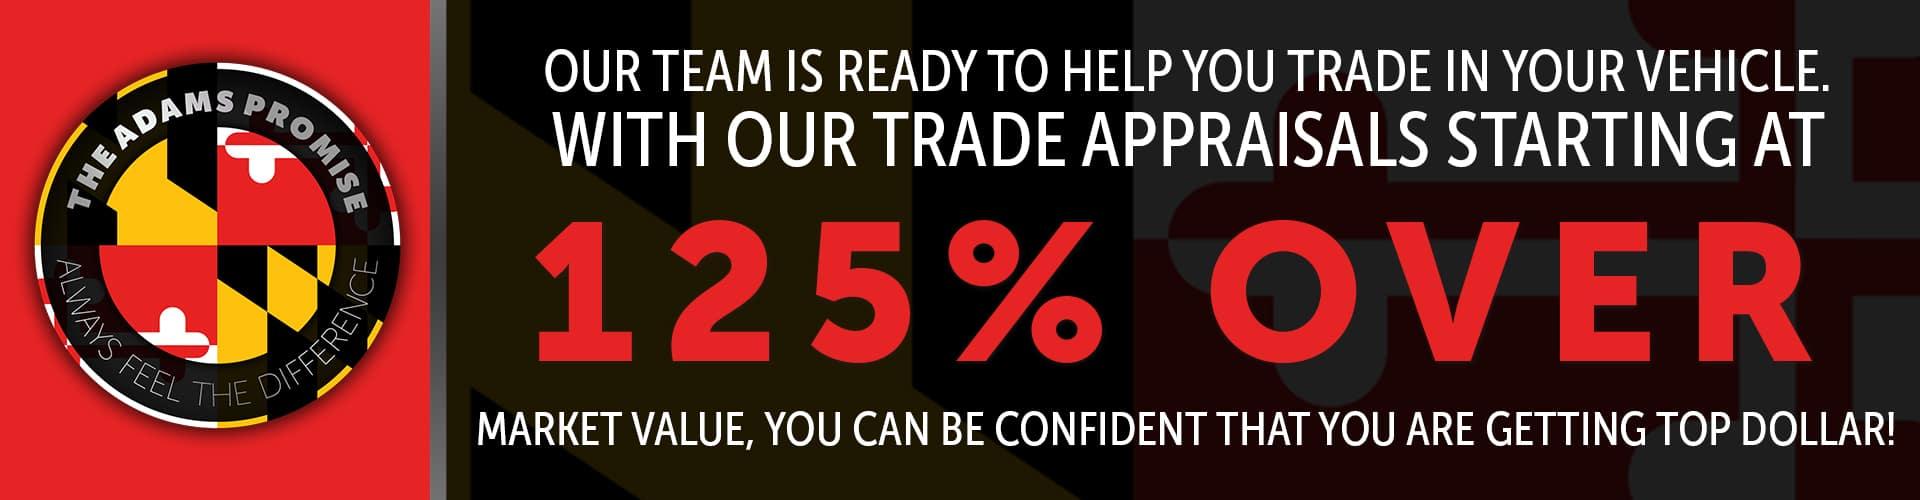 Trade Appraisals Starting at 125% Over Market Value!